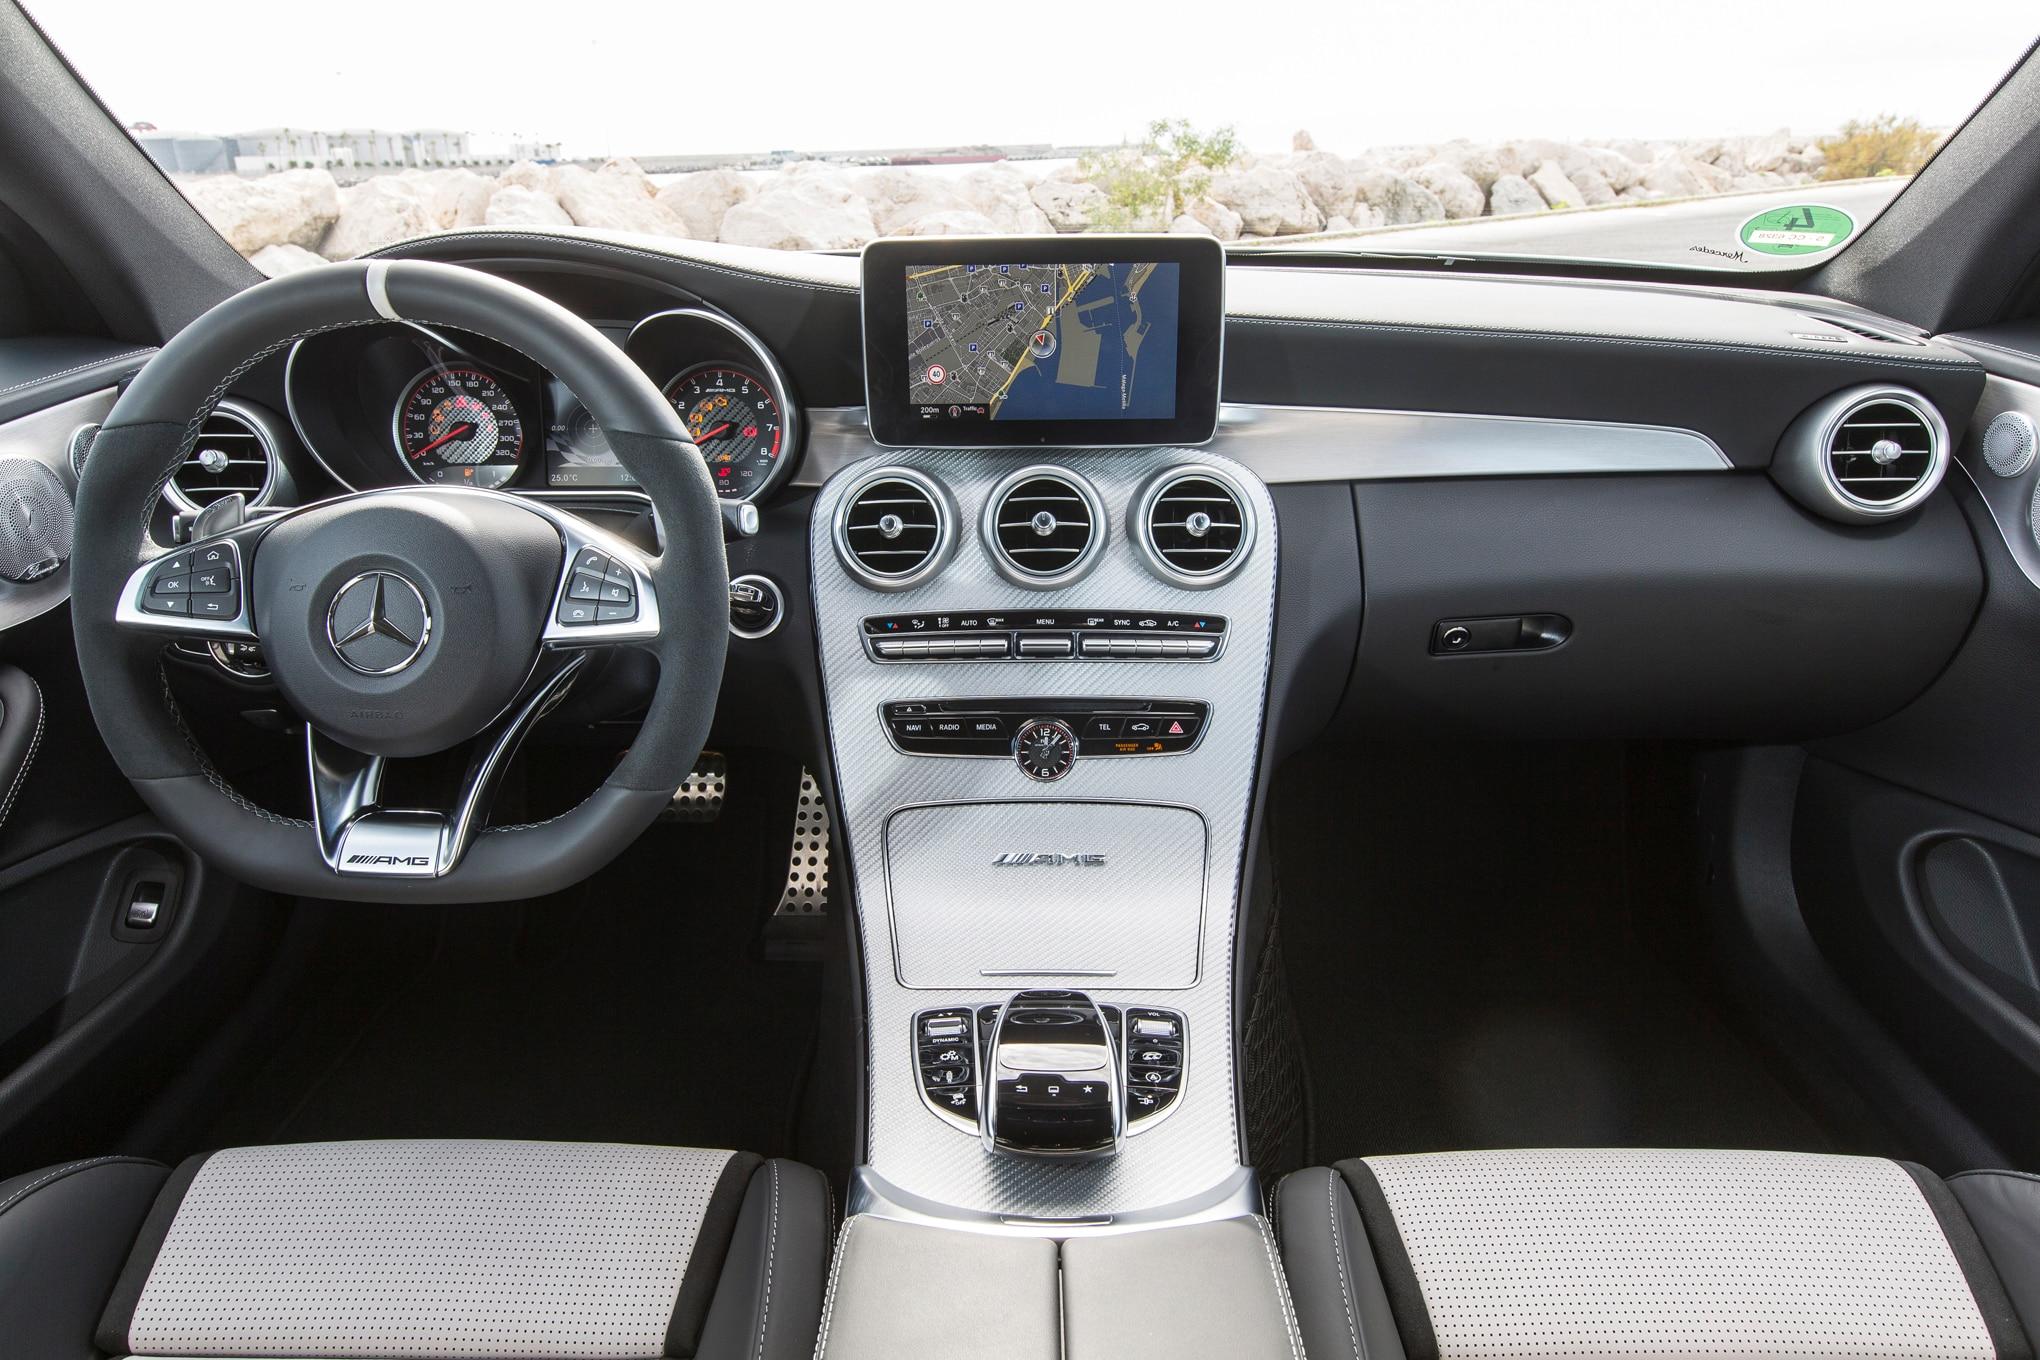 2017 mercedes amg c63 s coupe interior 03